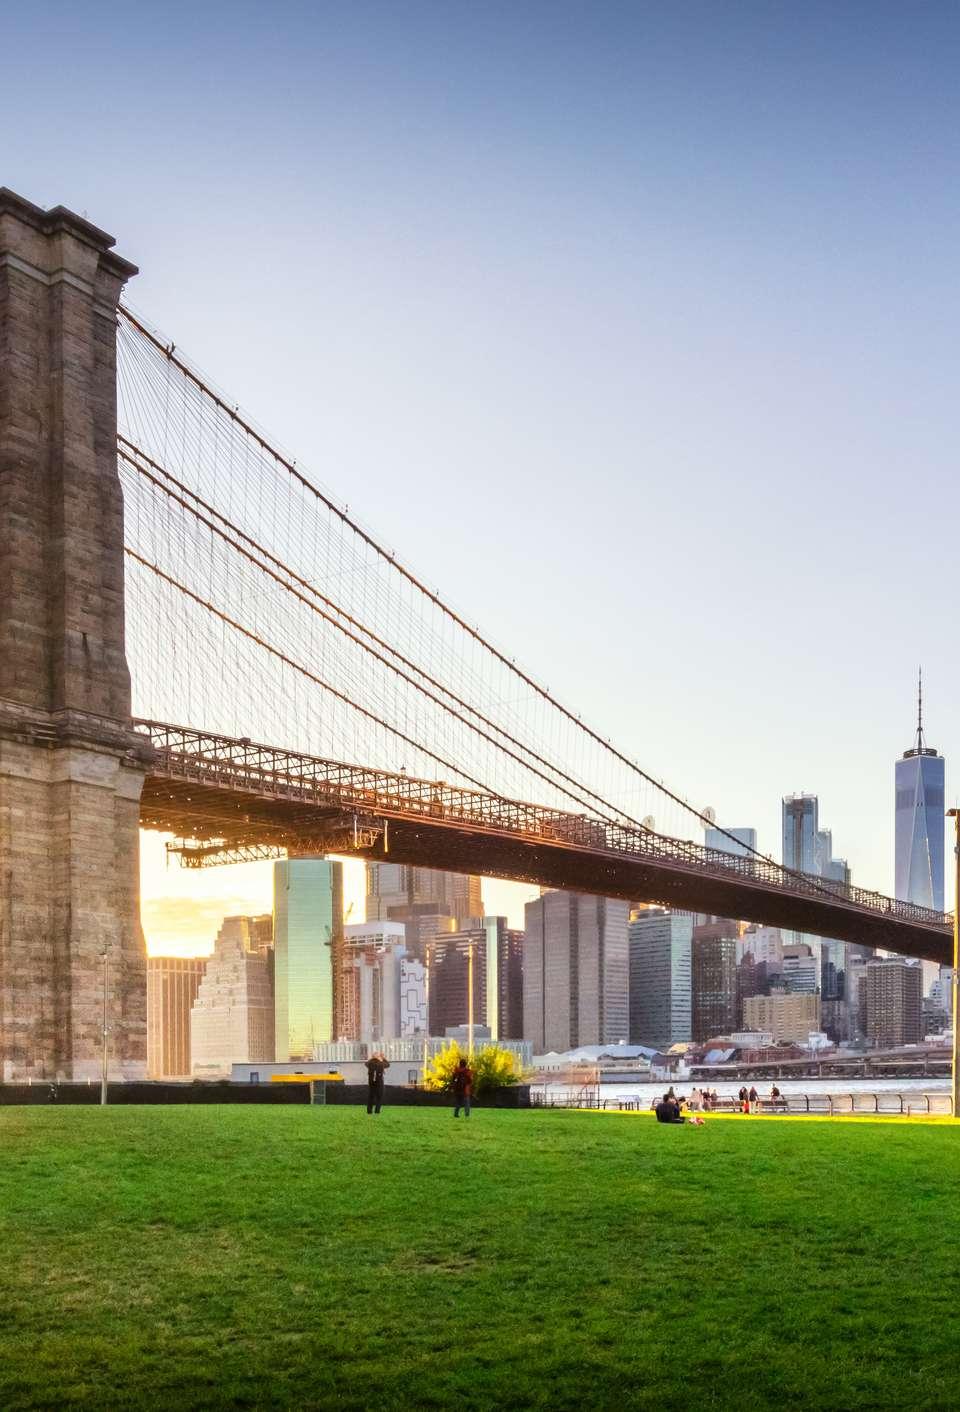 Brooklyn Bridge and Manhattan at sunset.